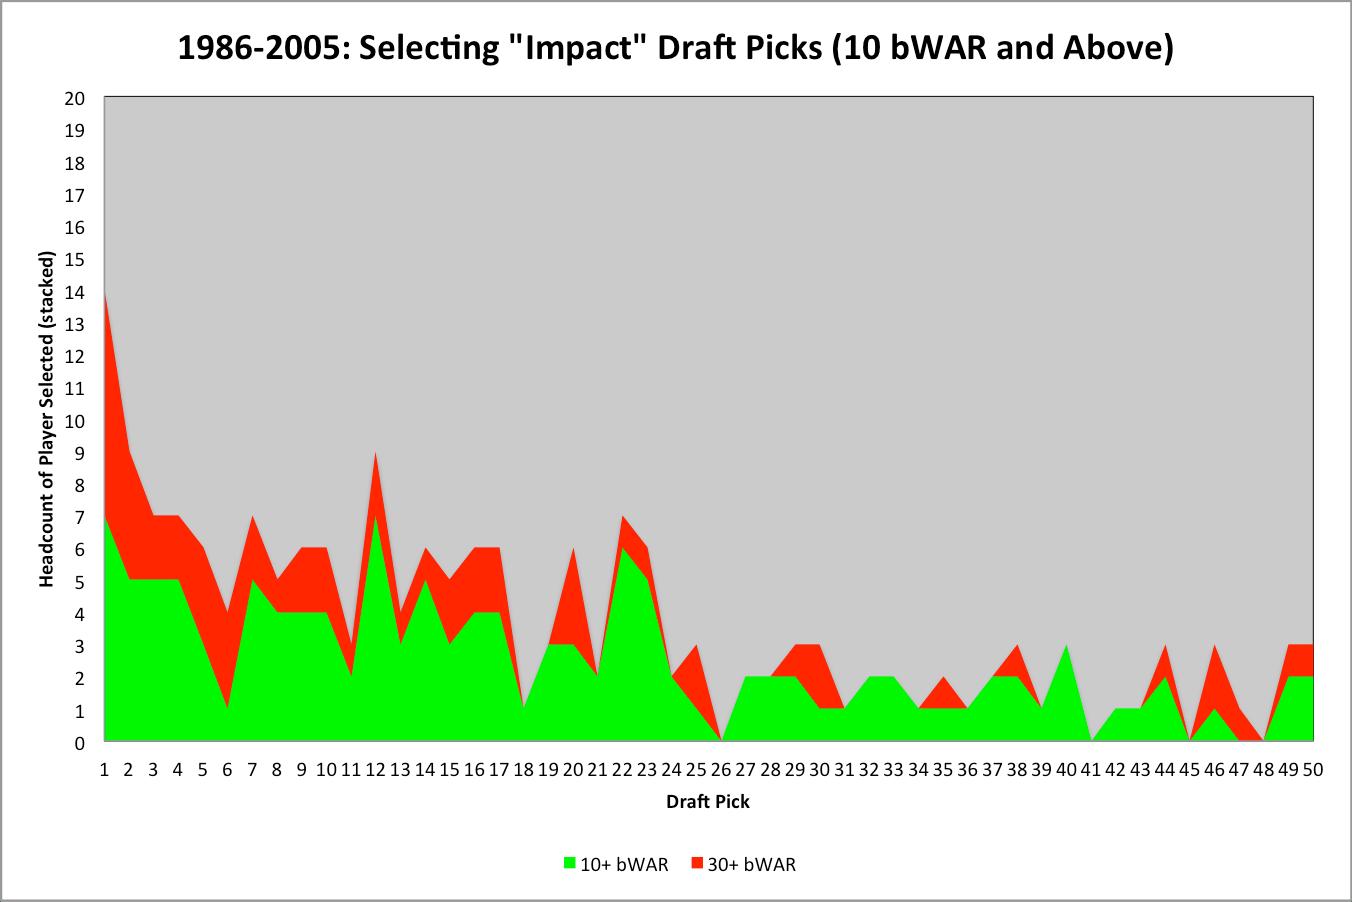 1986-2005 Impact Draft Pick